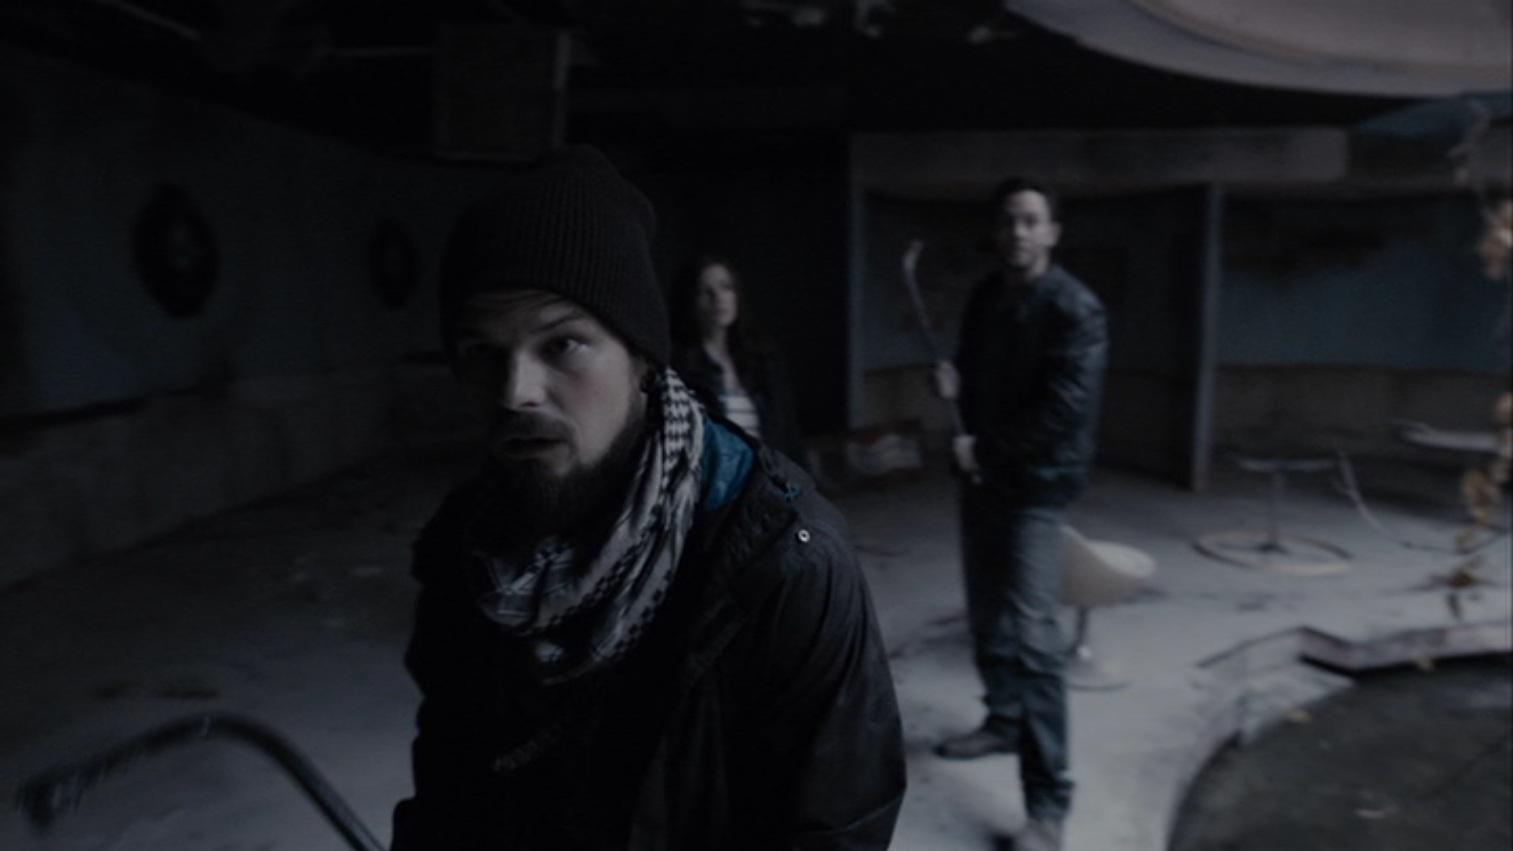 Happyotter: CHERNOBYL DIARIES (2012)